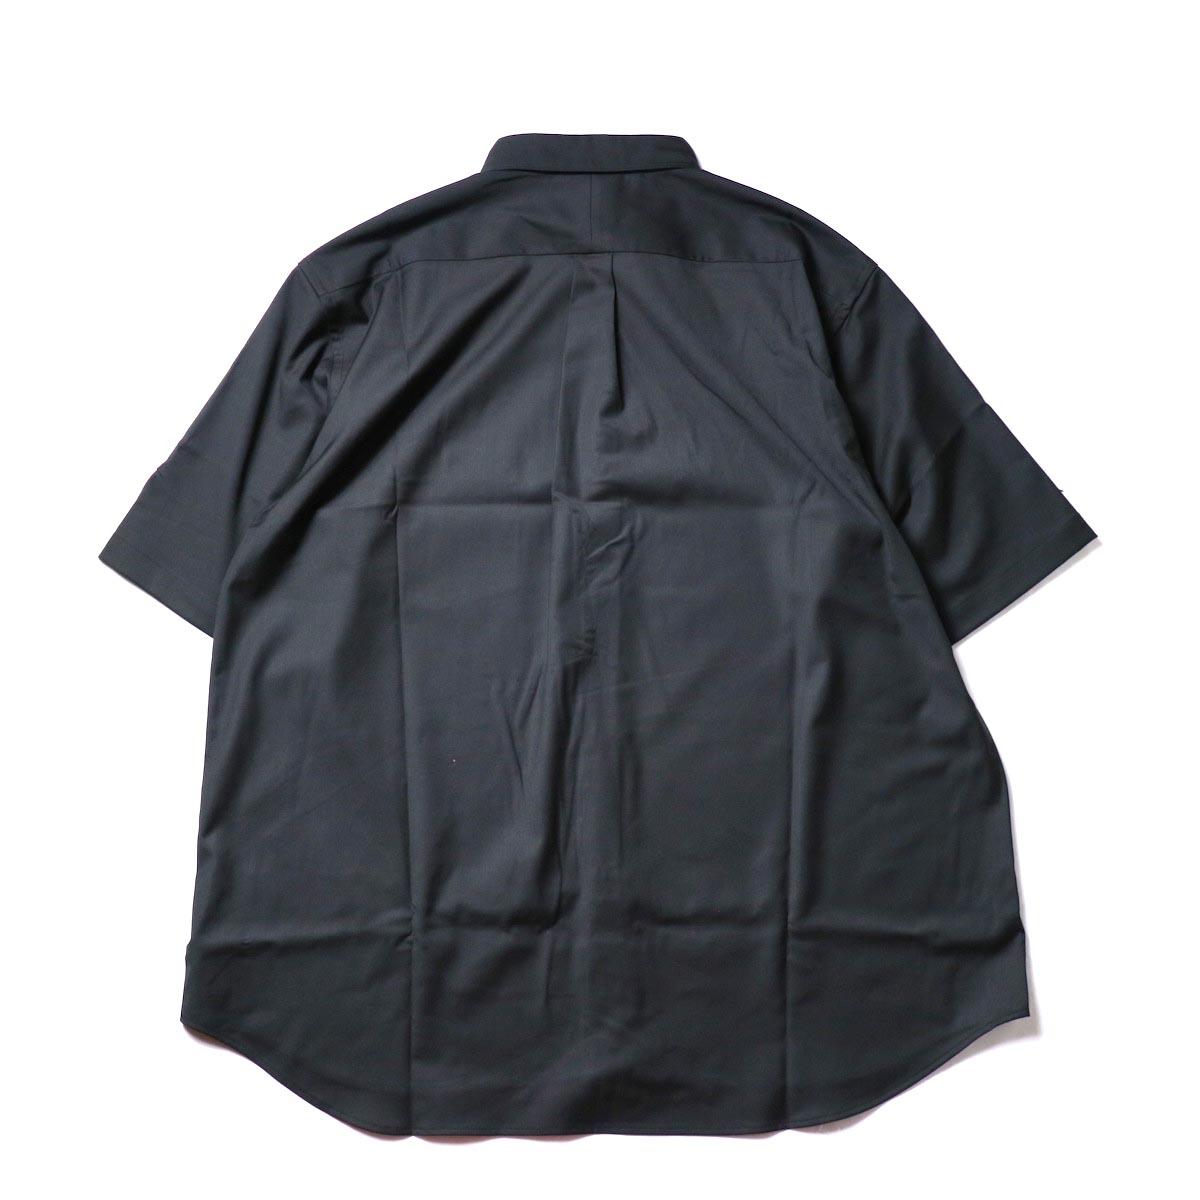 alvana / Wrinkle Proof Shirts (Black)背面